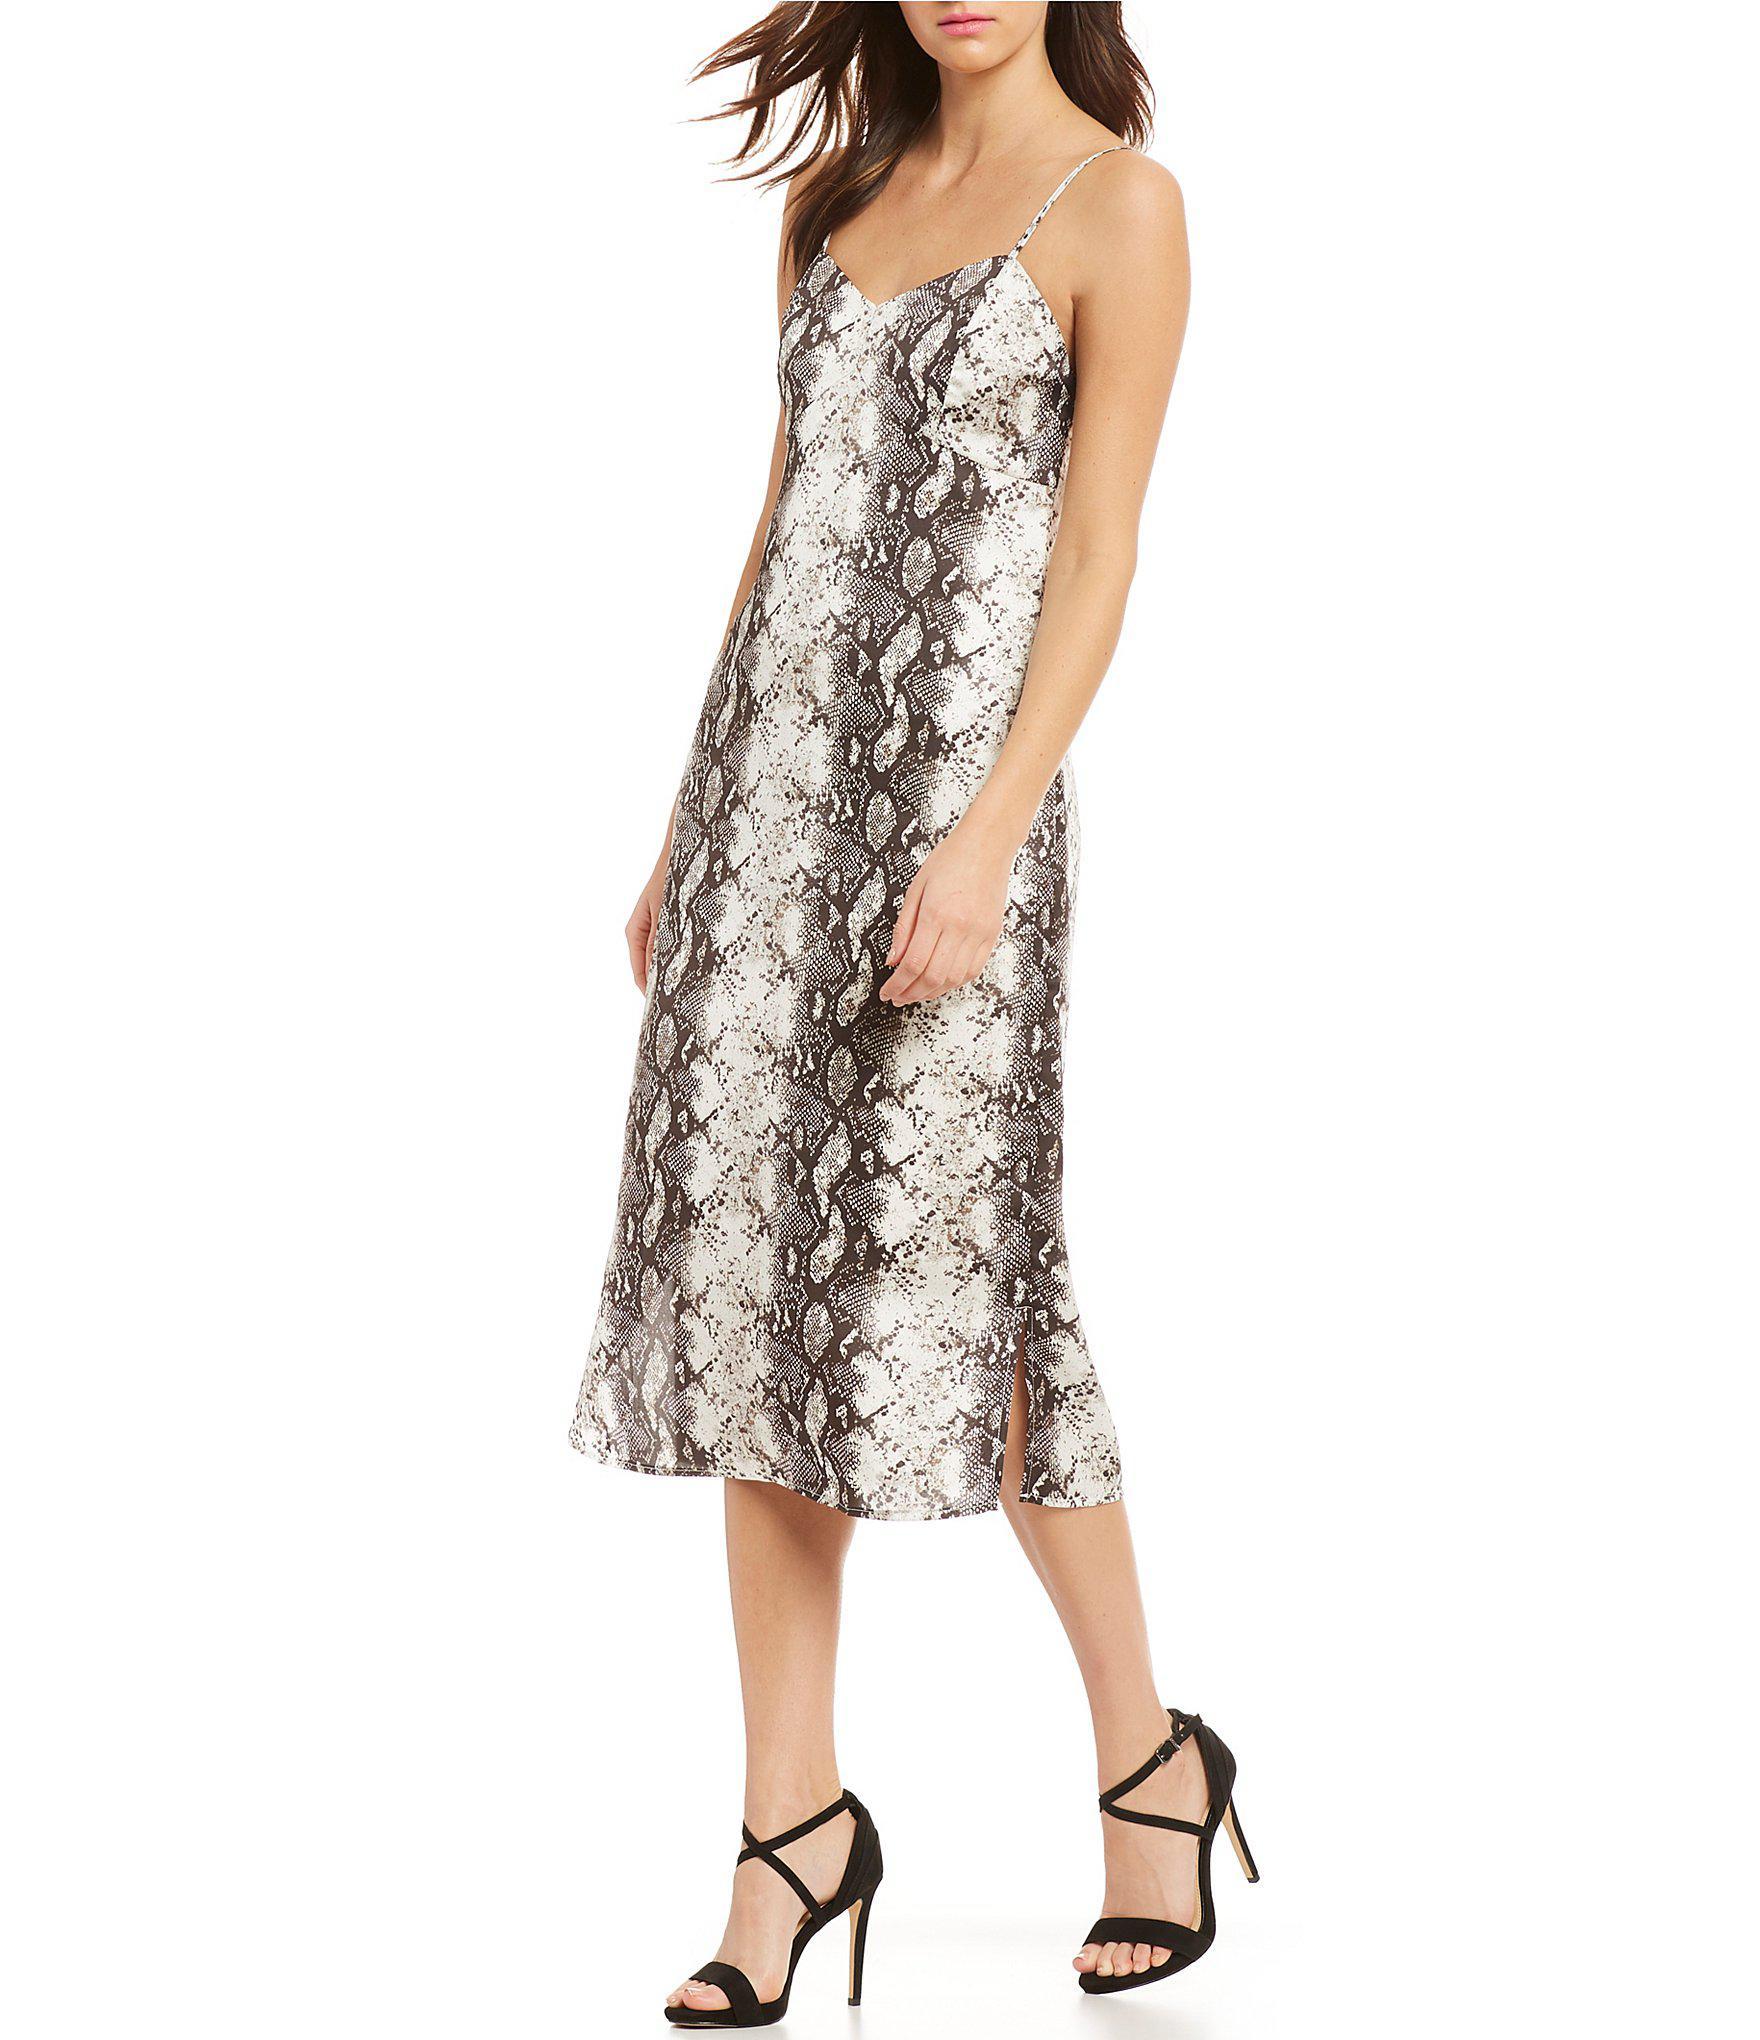 22815eed59 Gianni Bini Tana Python Snake Print Midi Length Slip Dress - Lyst